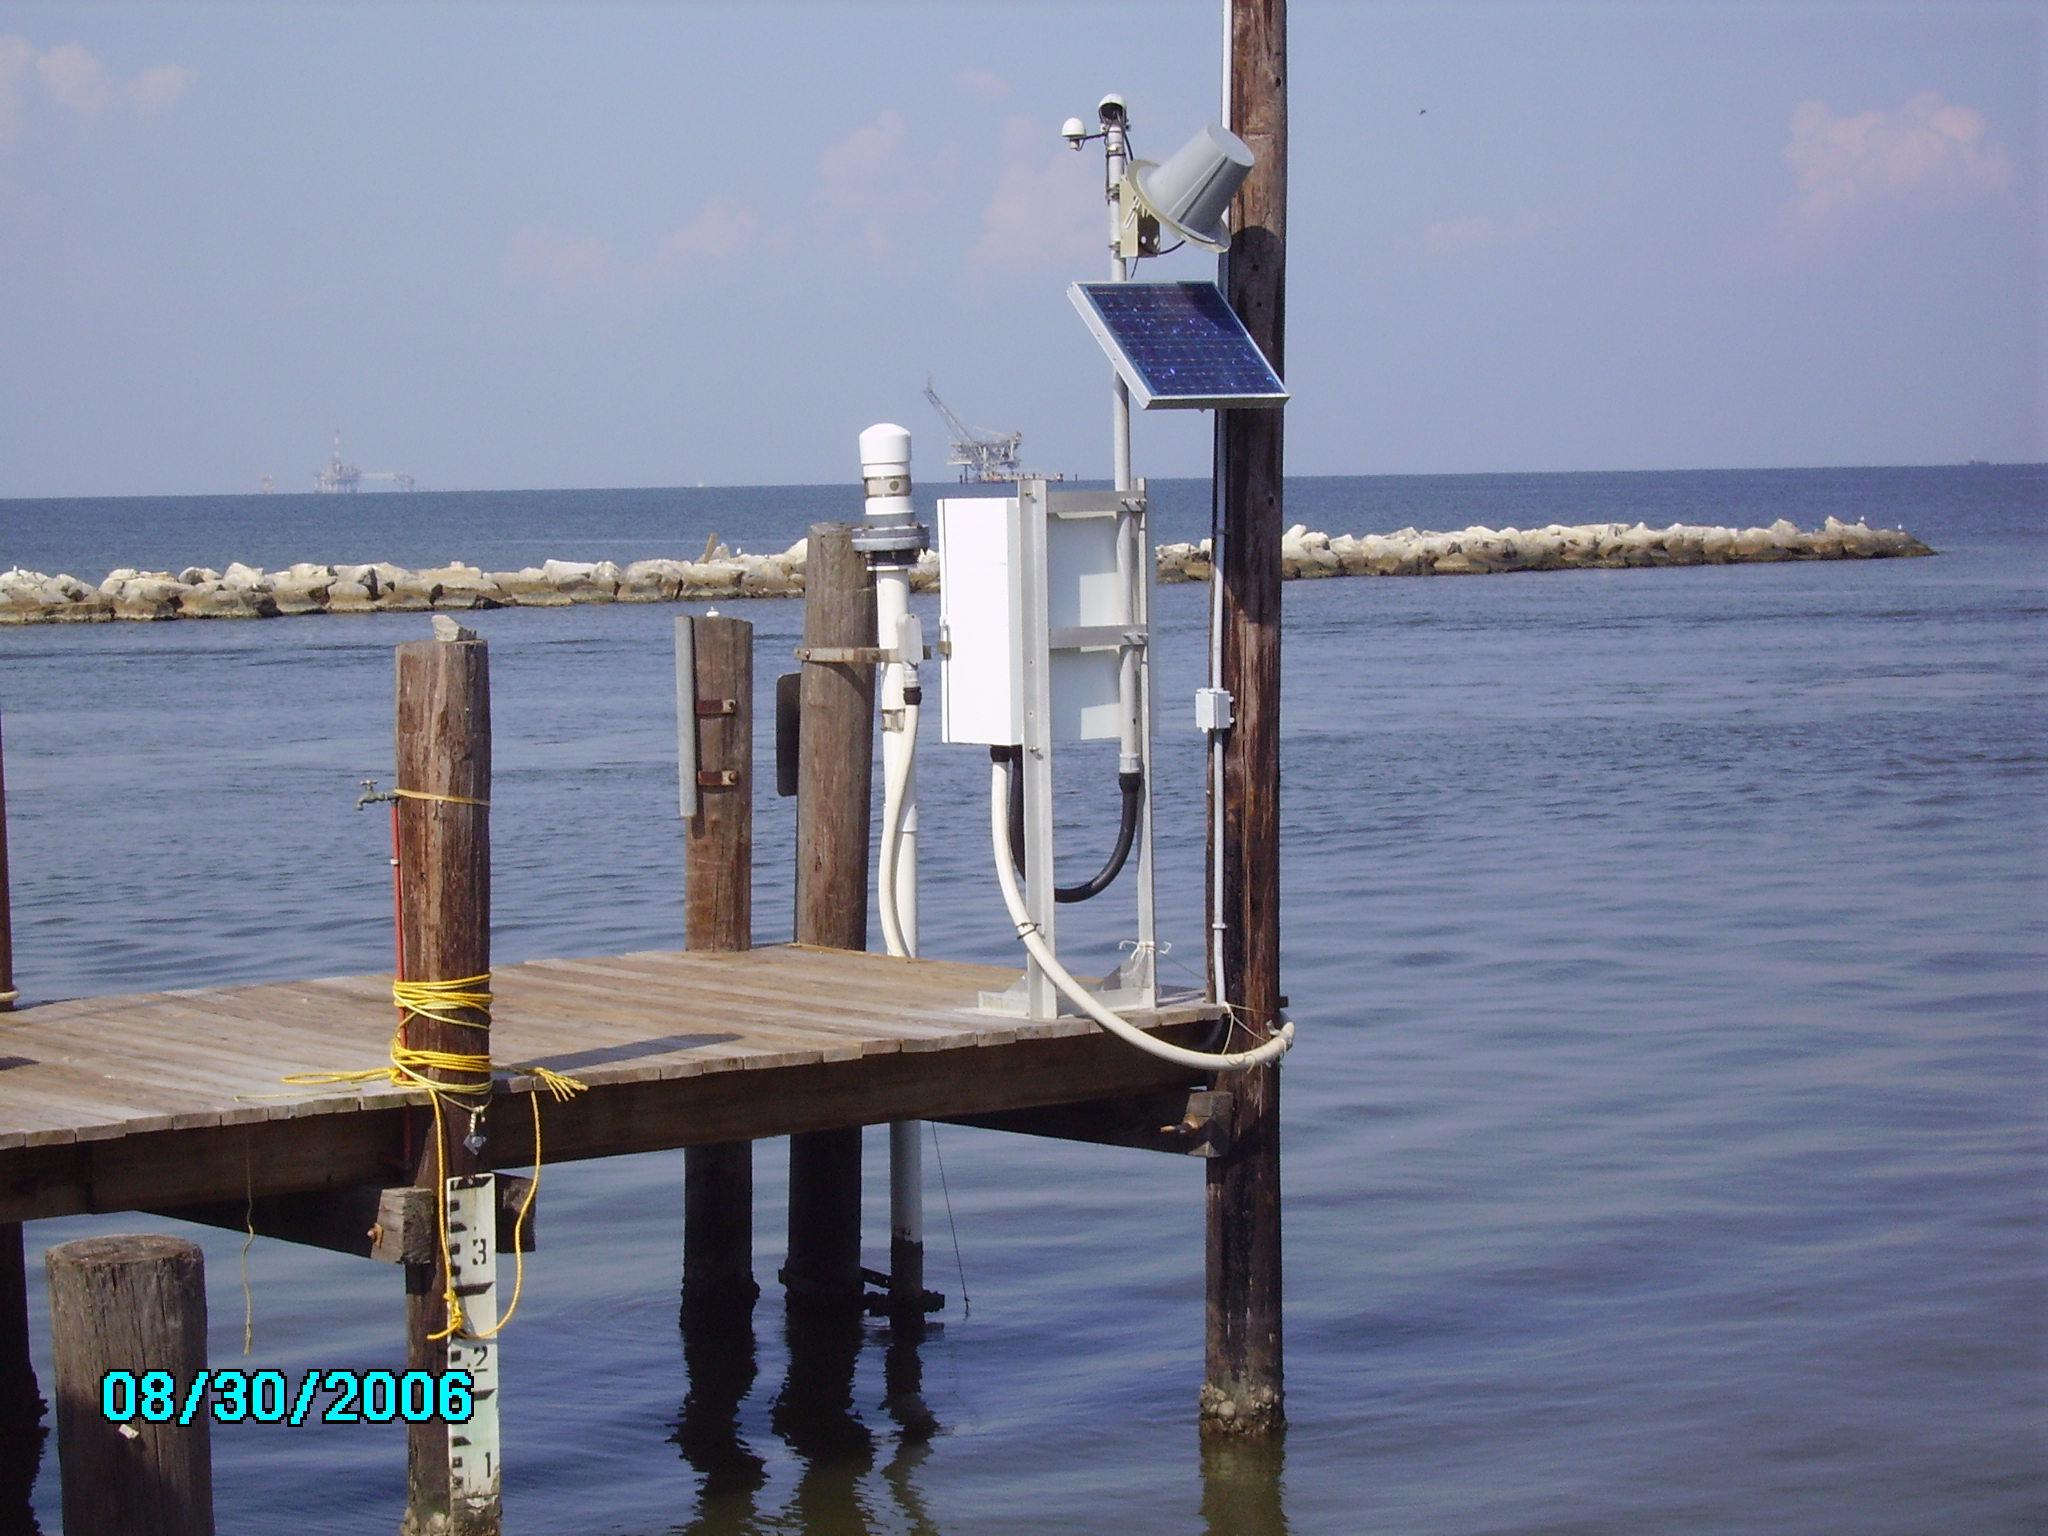 ultrasonic distance measurement thesis